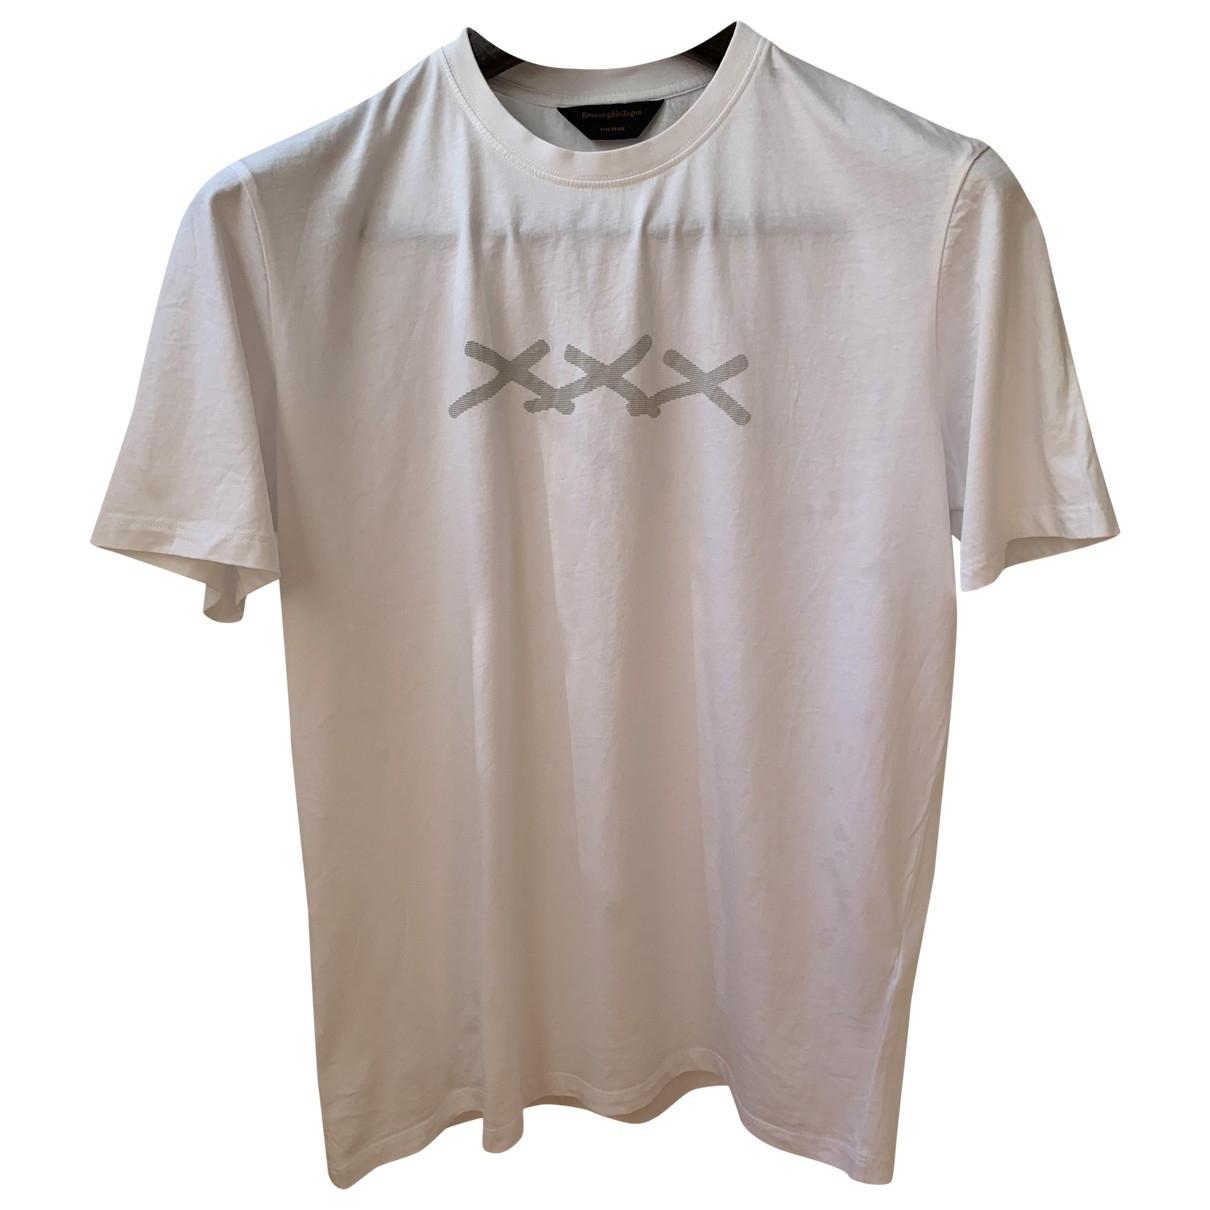 Ermenegildo Zegna \N T-Shirts in  Weiss Baumwolle